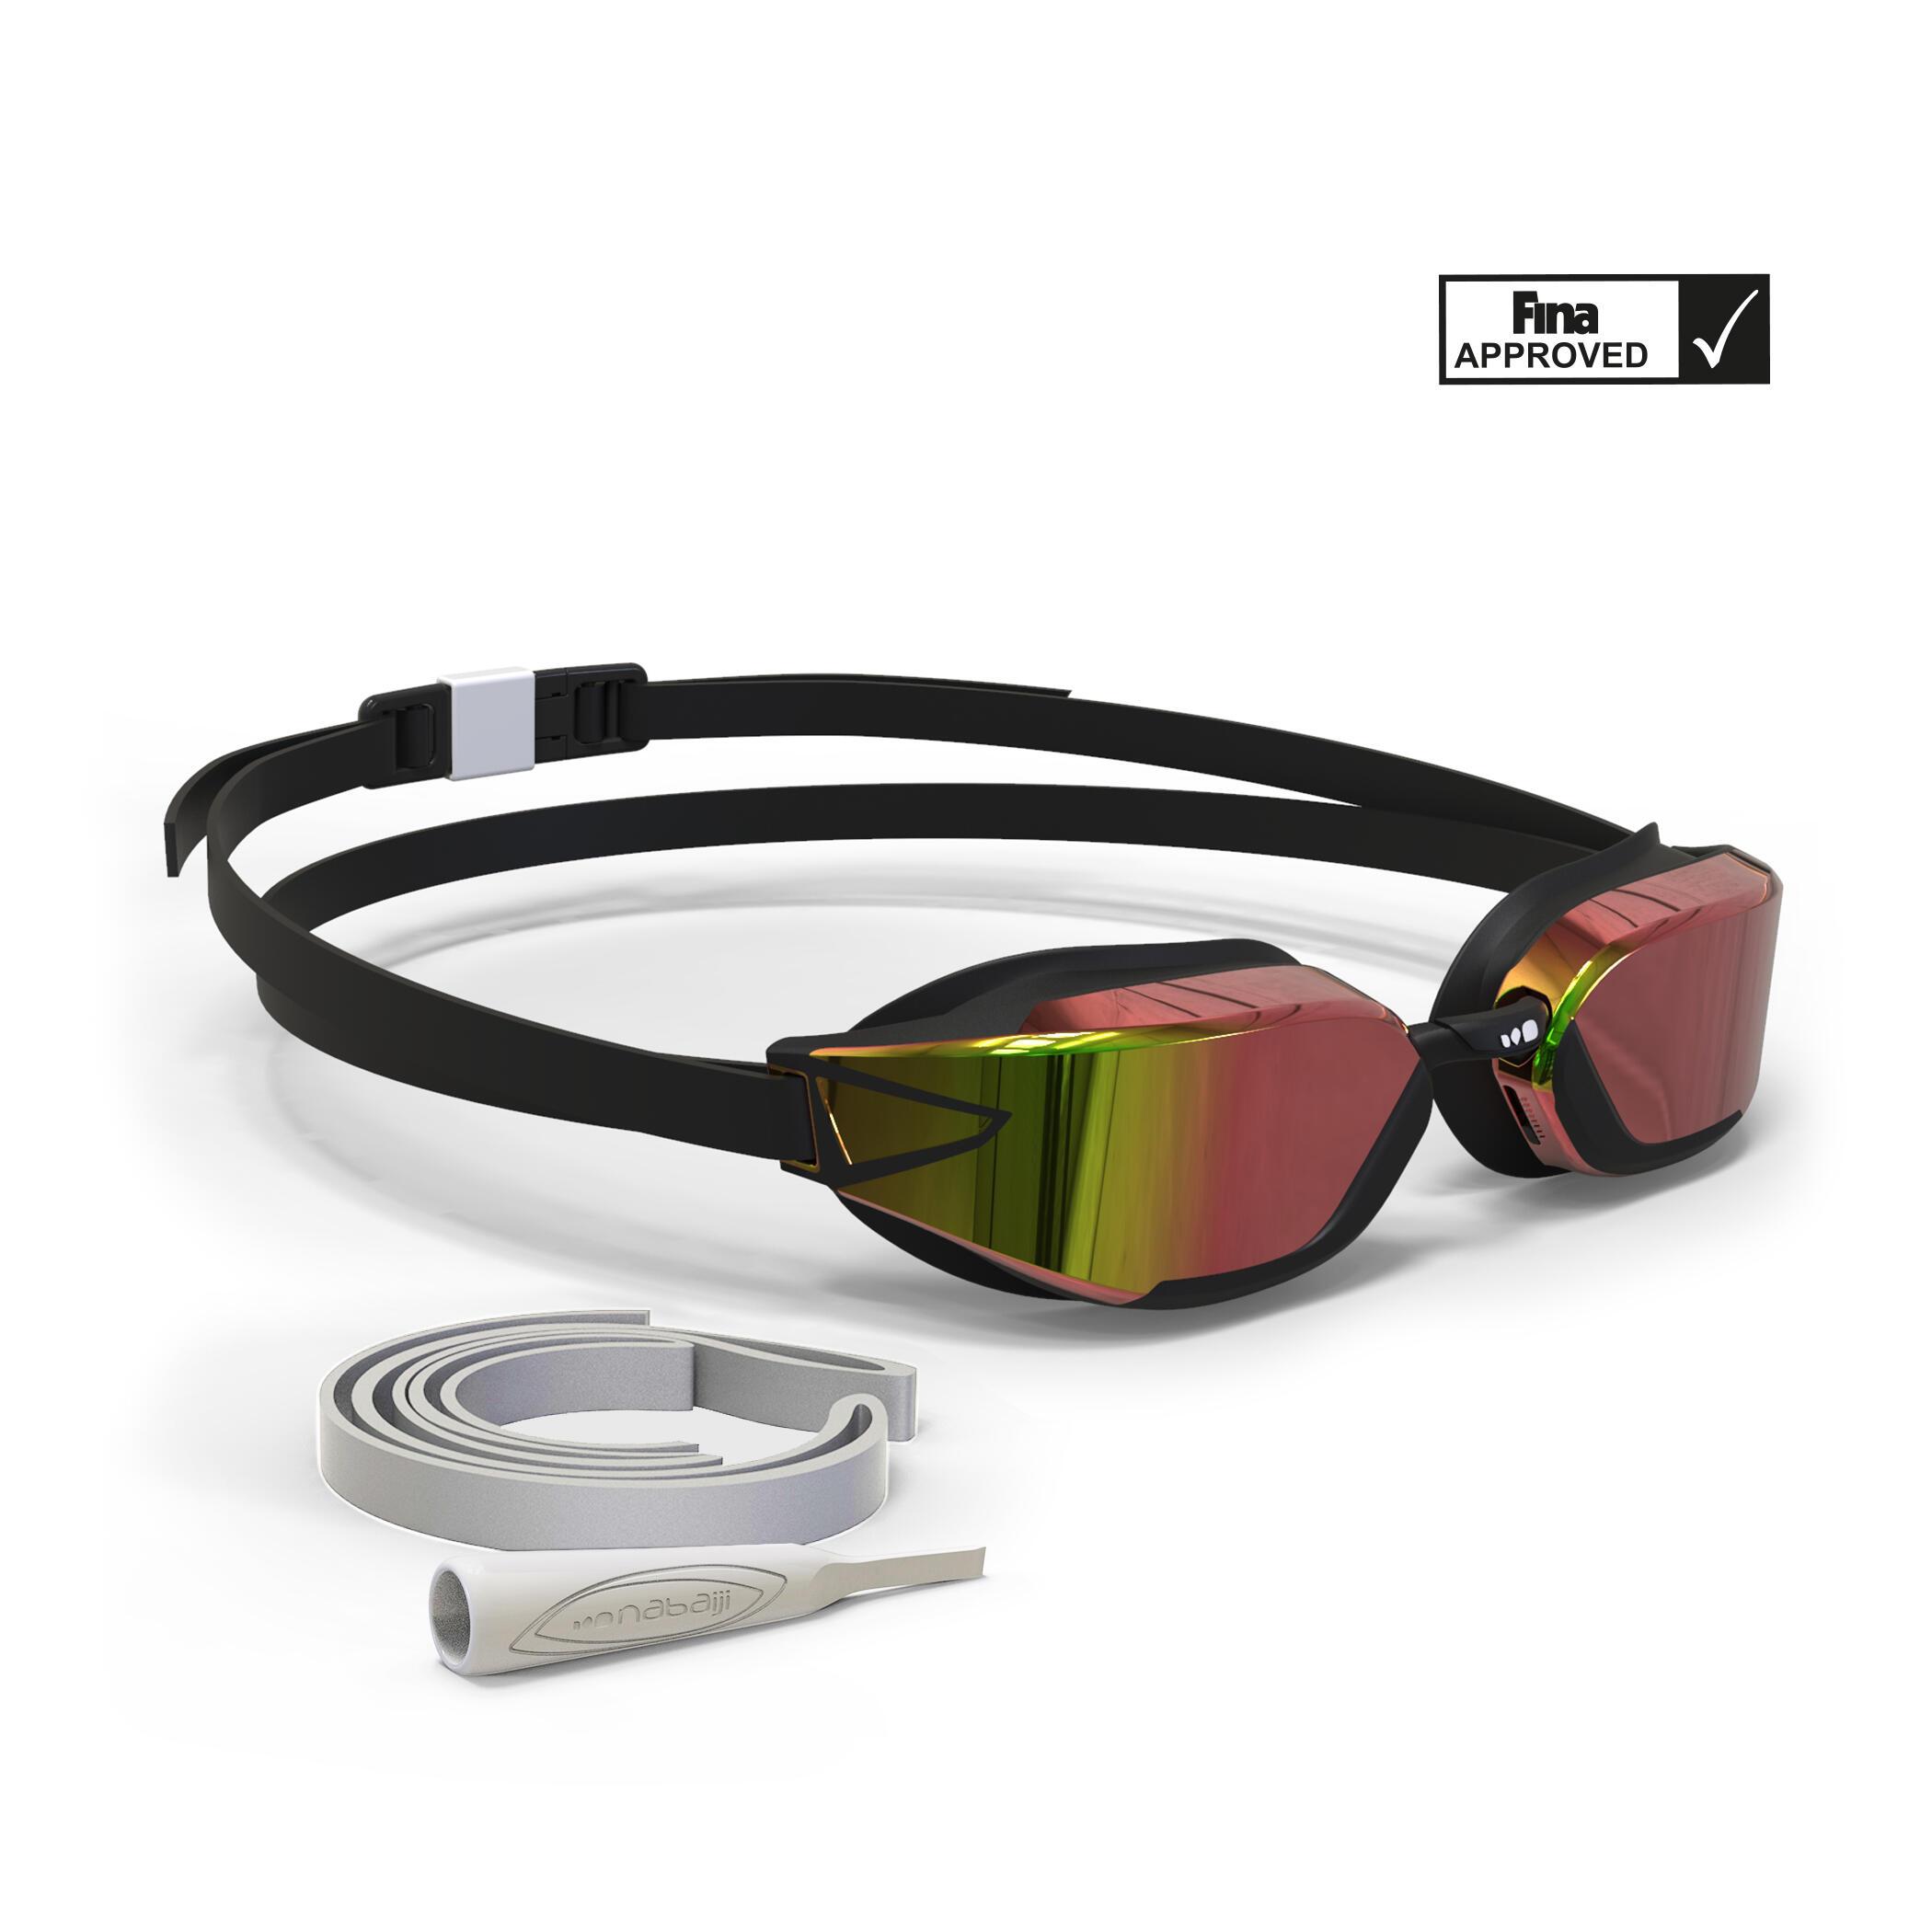 0514b23e738fcc Nabaiji Zwembrilletje 900 B-Fast zwart groen lichte glazen | Decathlon.nl